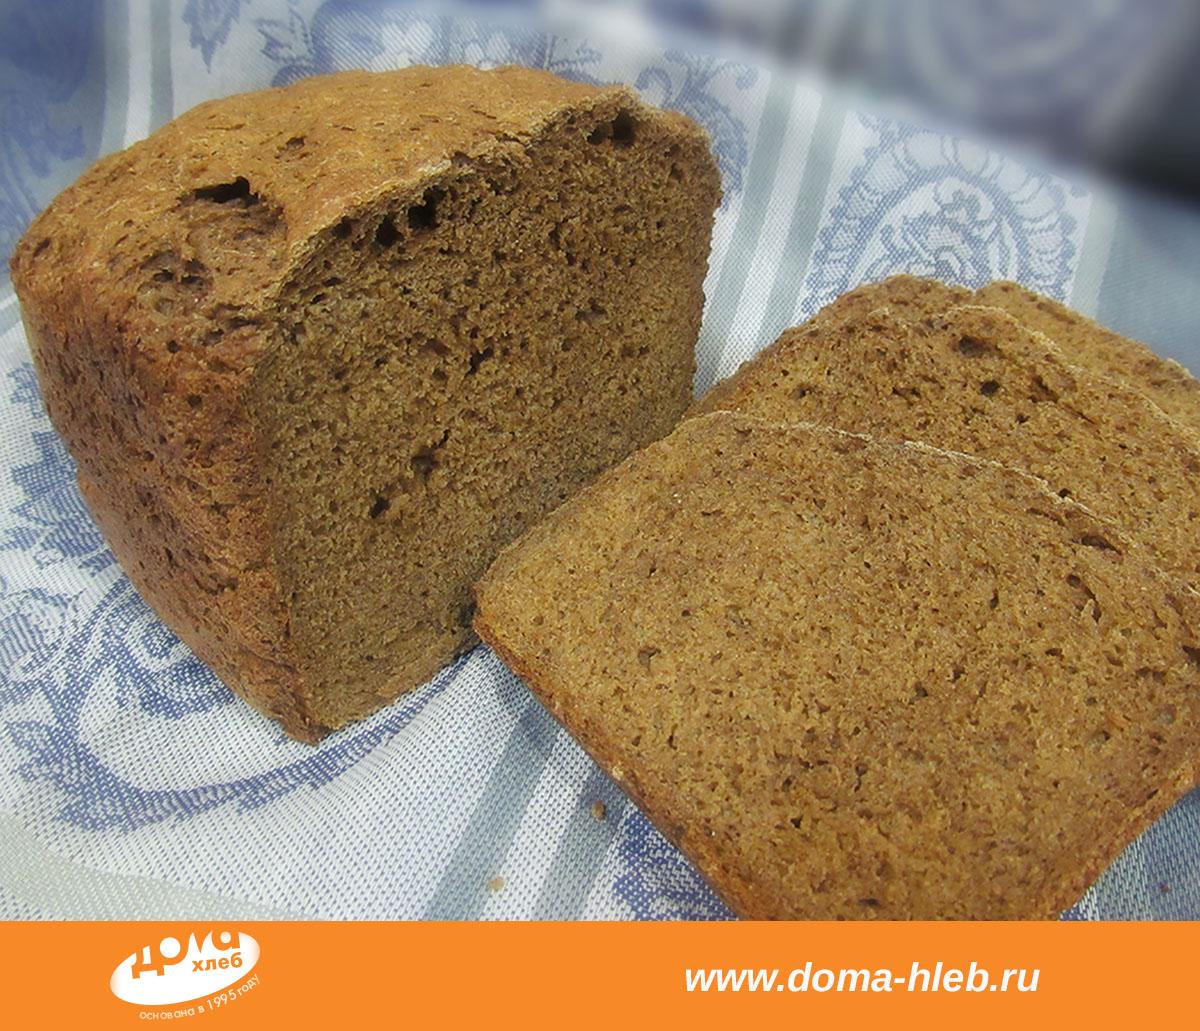 Рецепт ржаного хлеба в домашних условиях